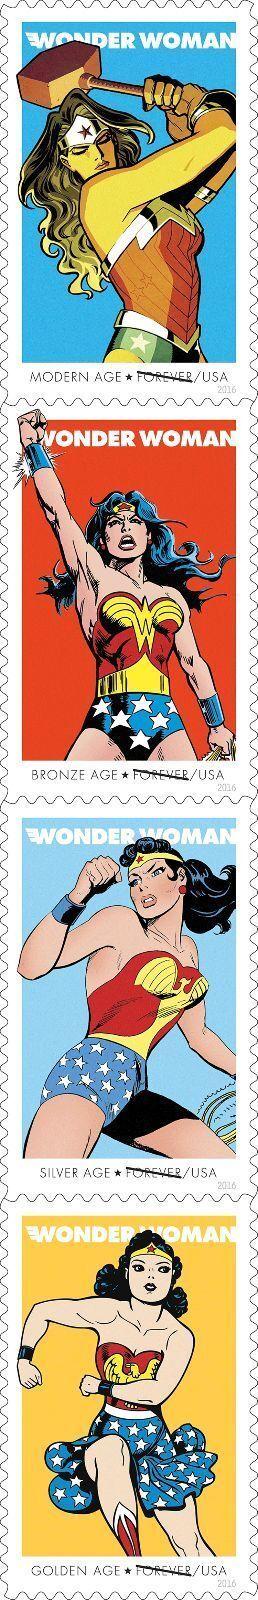 2016 47c Comic Book Wonder Woman, 75th, Strip of 4 Scot